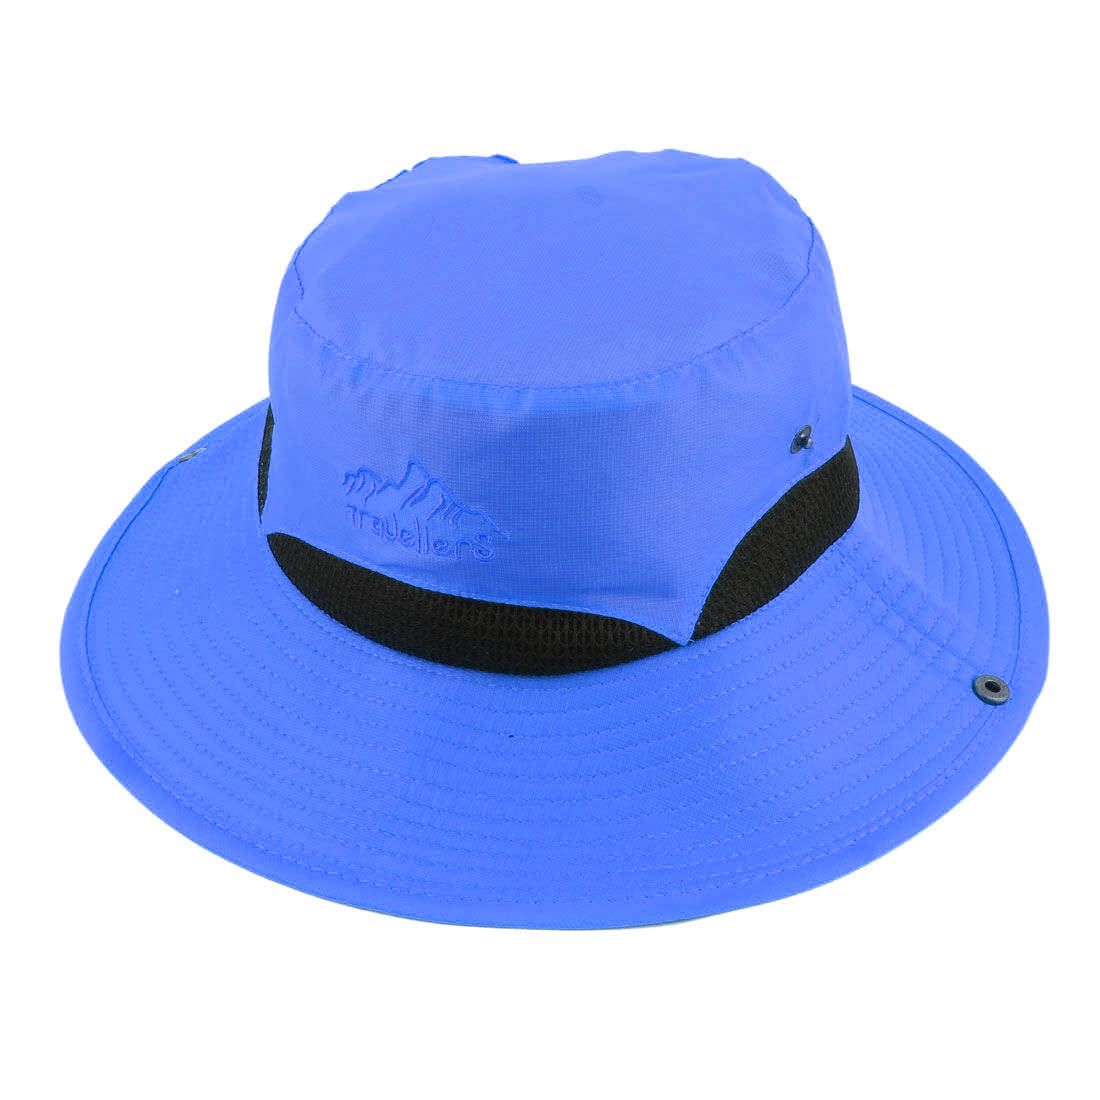 Ladies Women Polyester Foldable Head Decor Summer Protective Traveling Wide Brim Sun Cap Beach Fishing Hat Blue